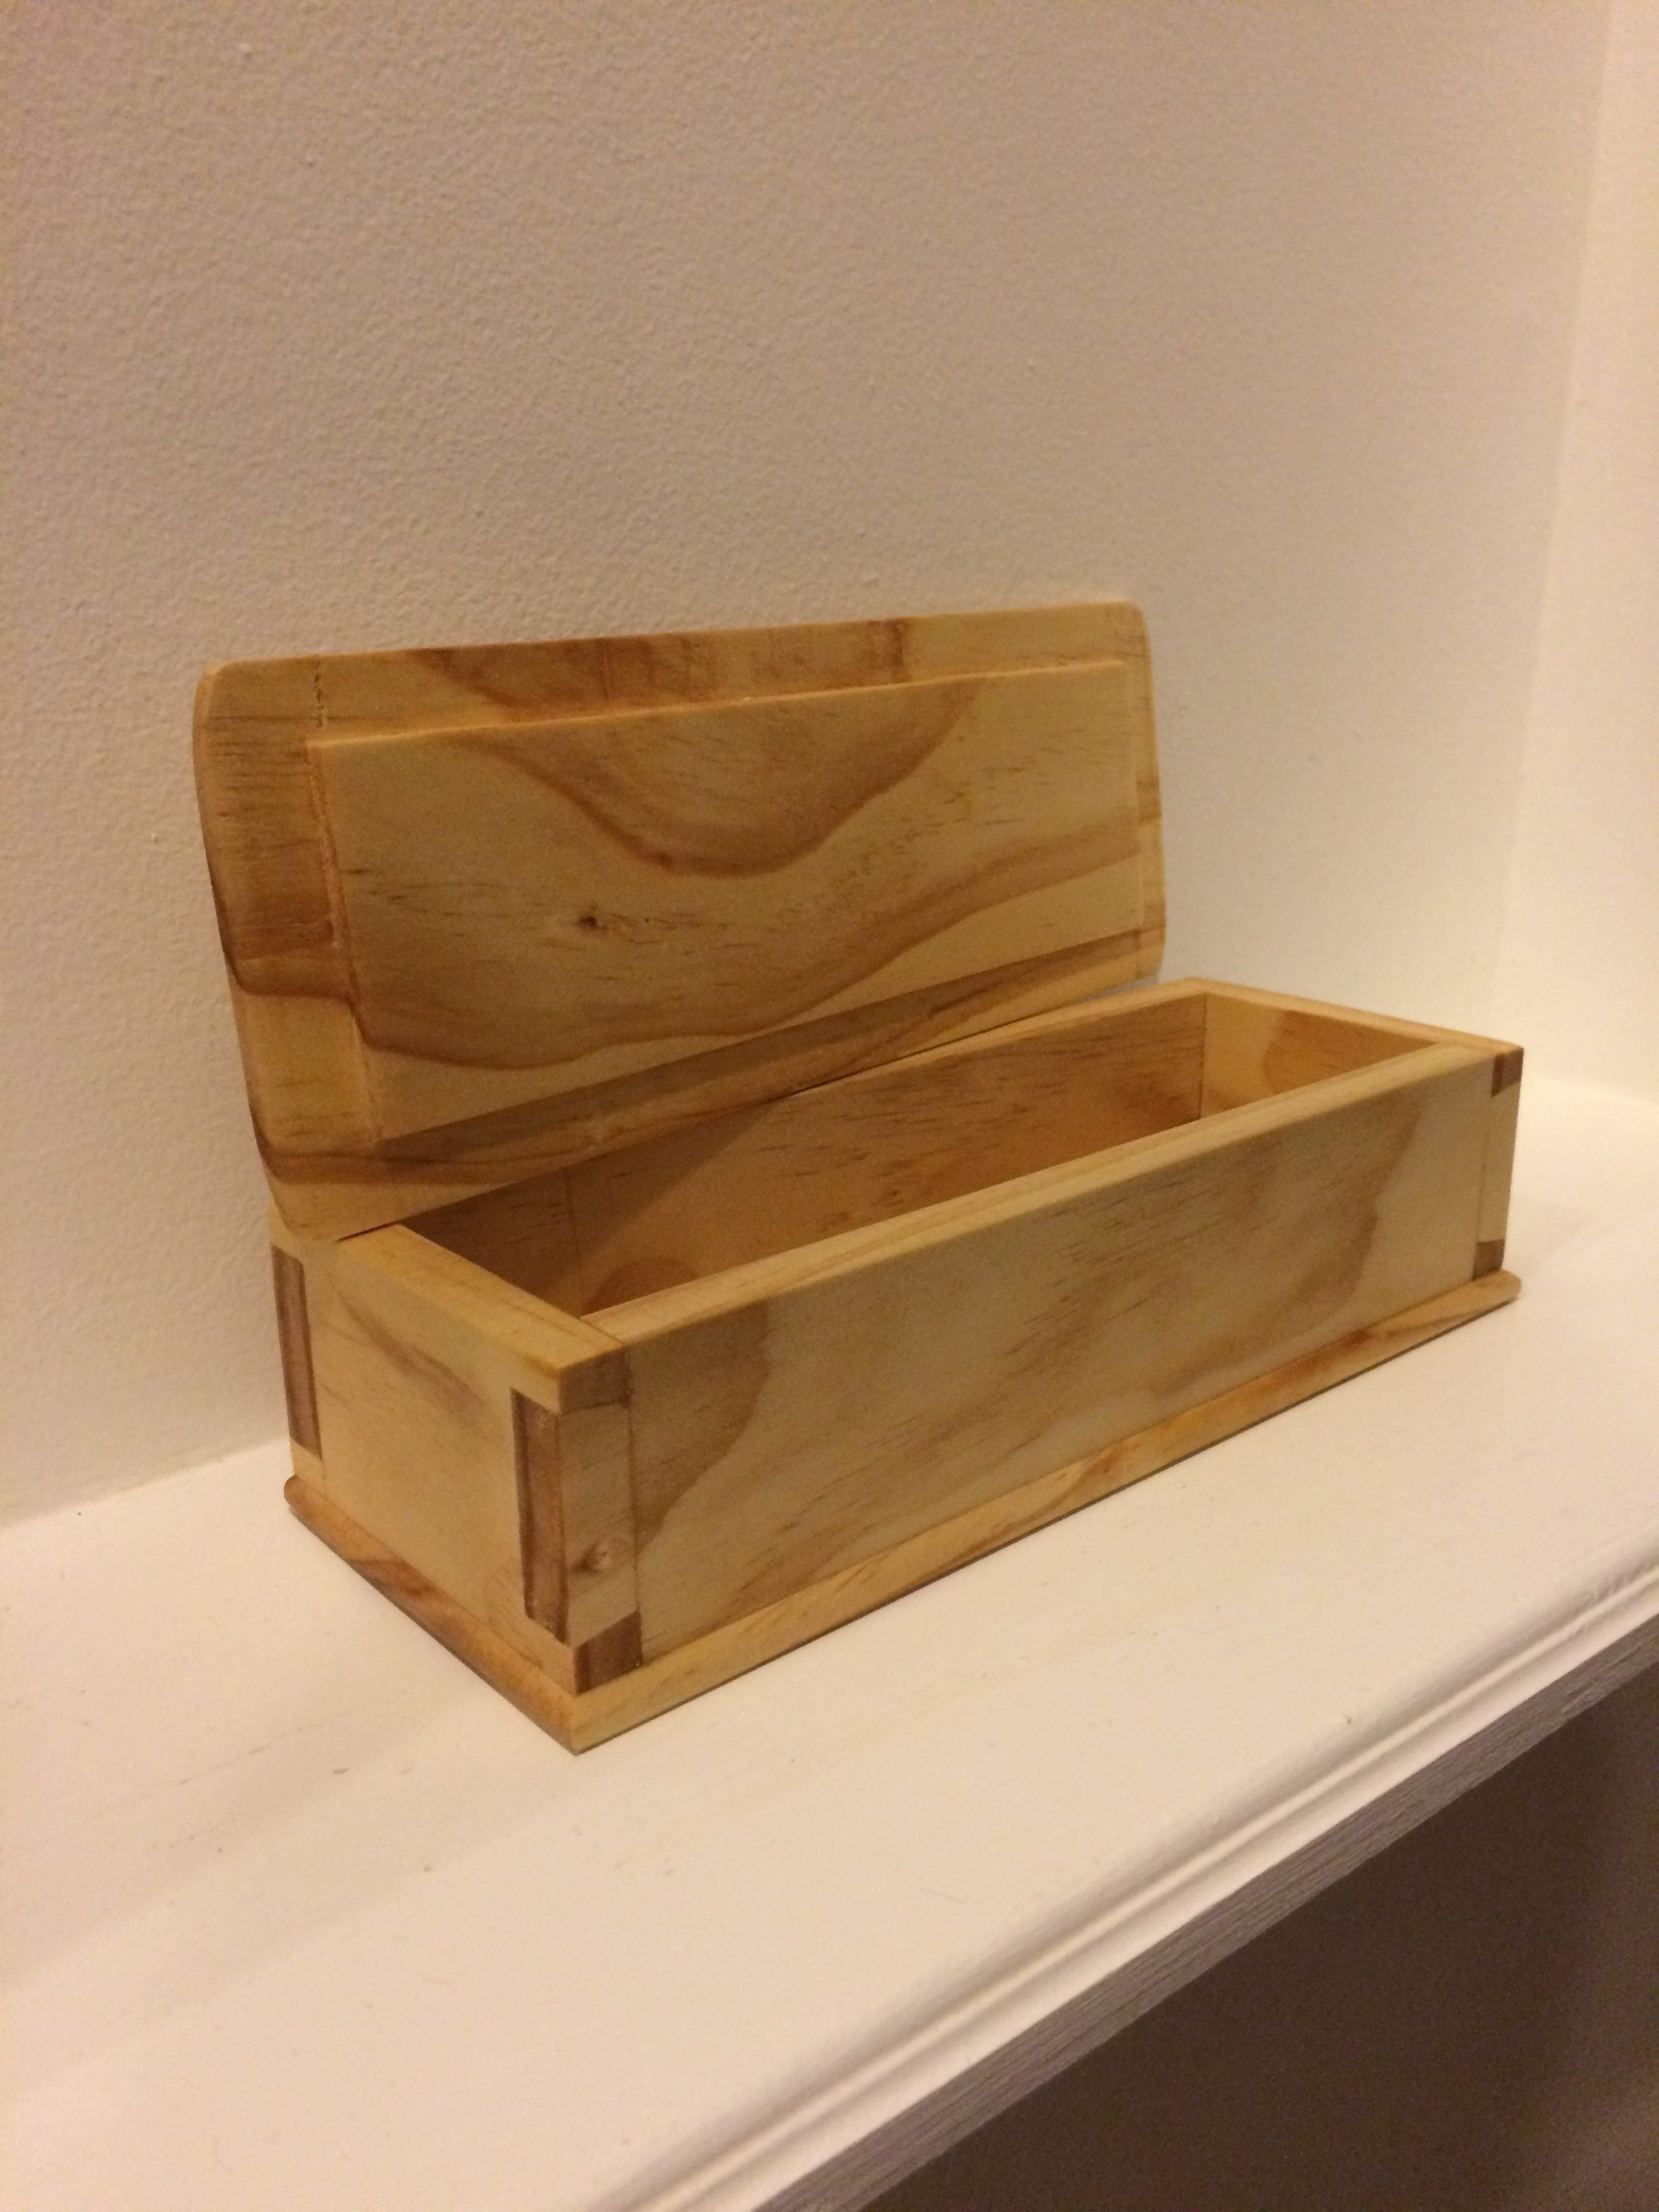 Dovetail Box by Glenn Kuffel